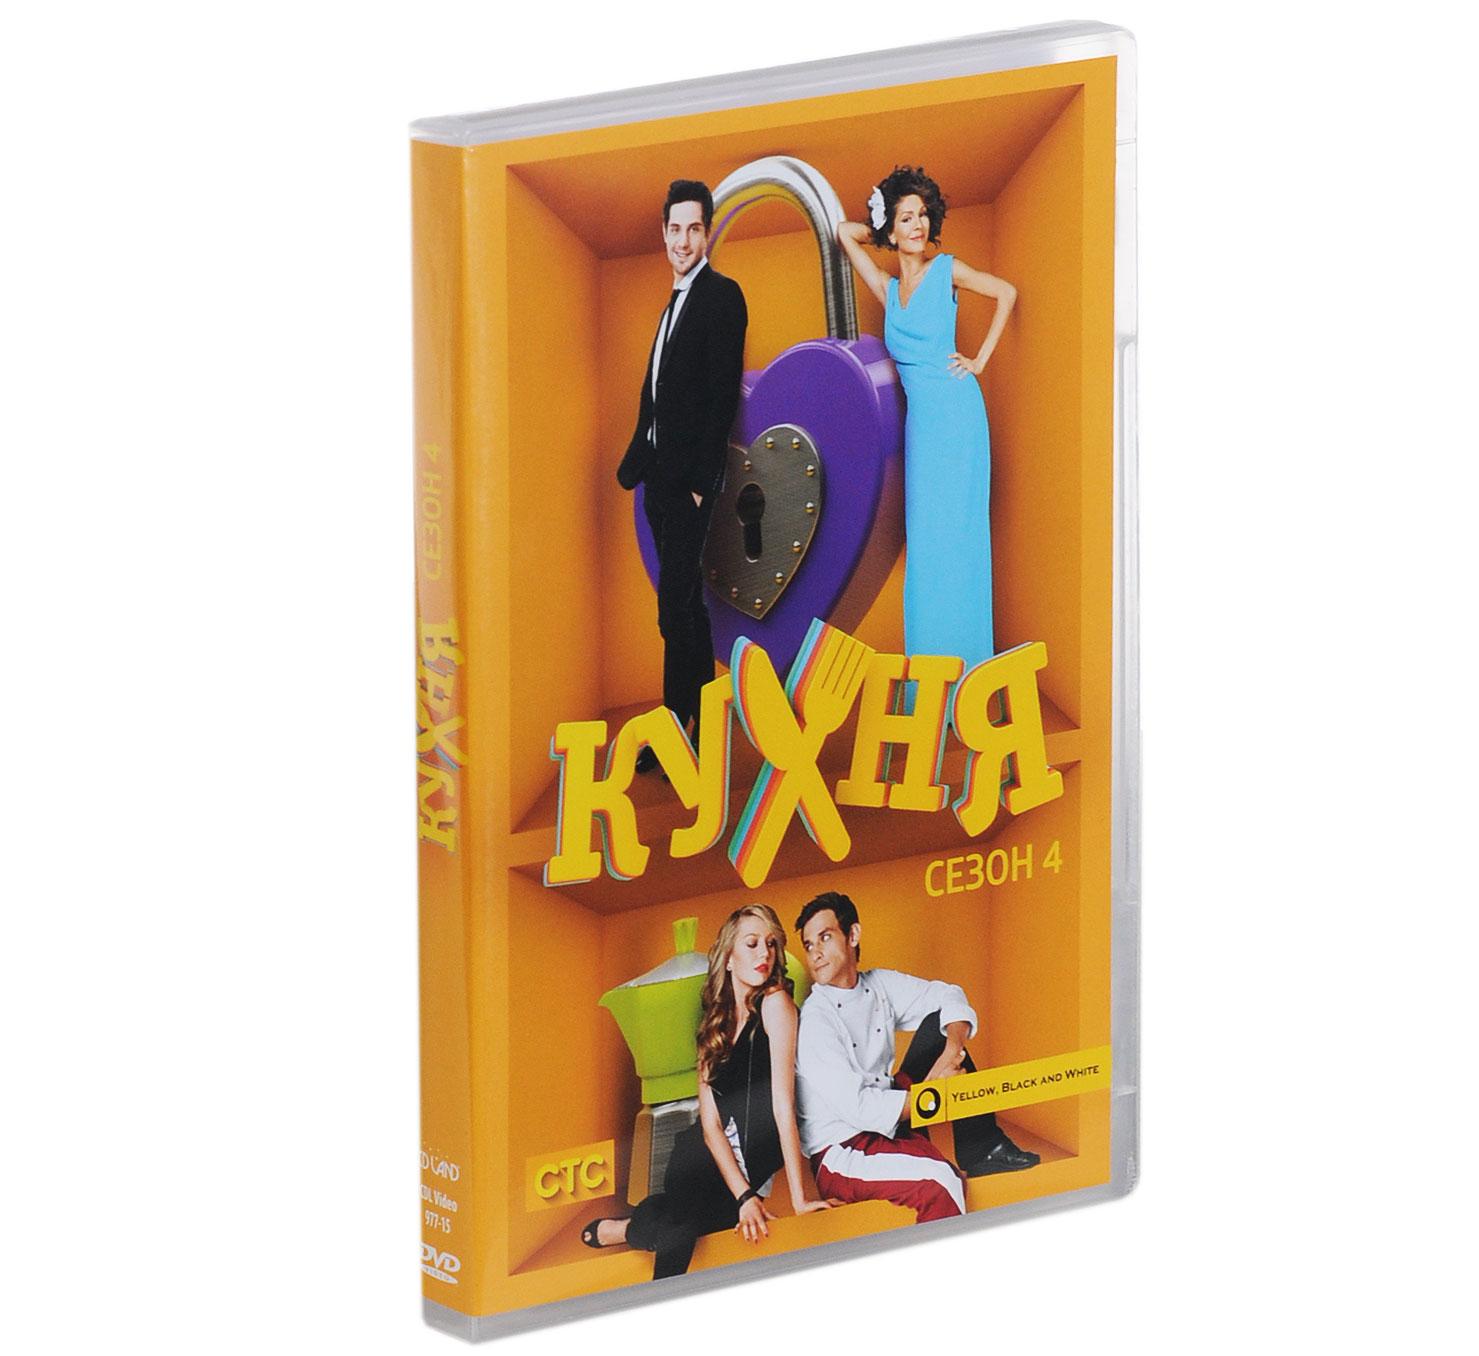 Кухня: Сезон 4, серии 1-20 (2 DVD)